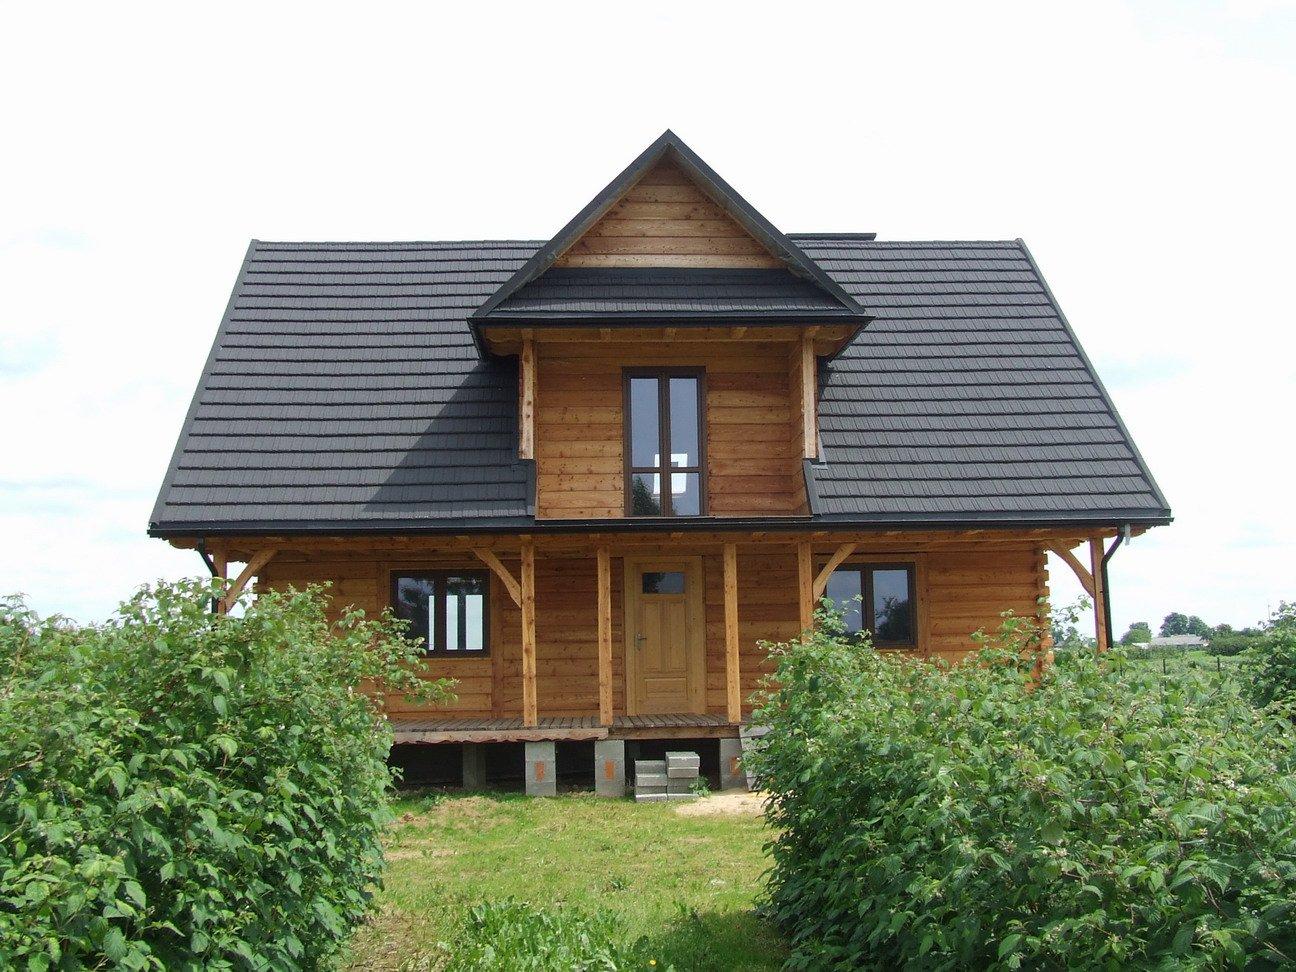 projekt-domu-ranczo-realizacja-fot-1-1374827237-kievh1lb.jpg